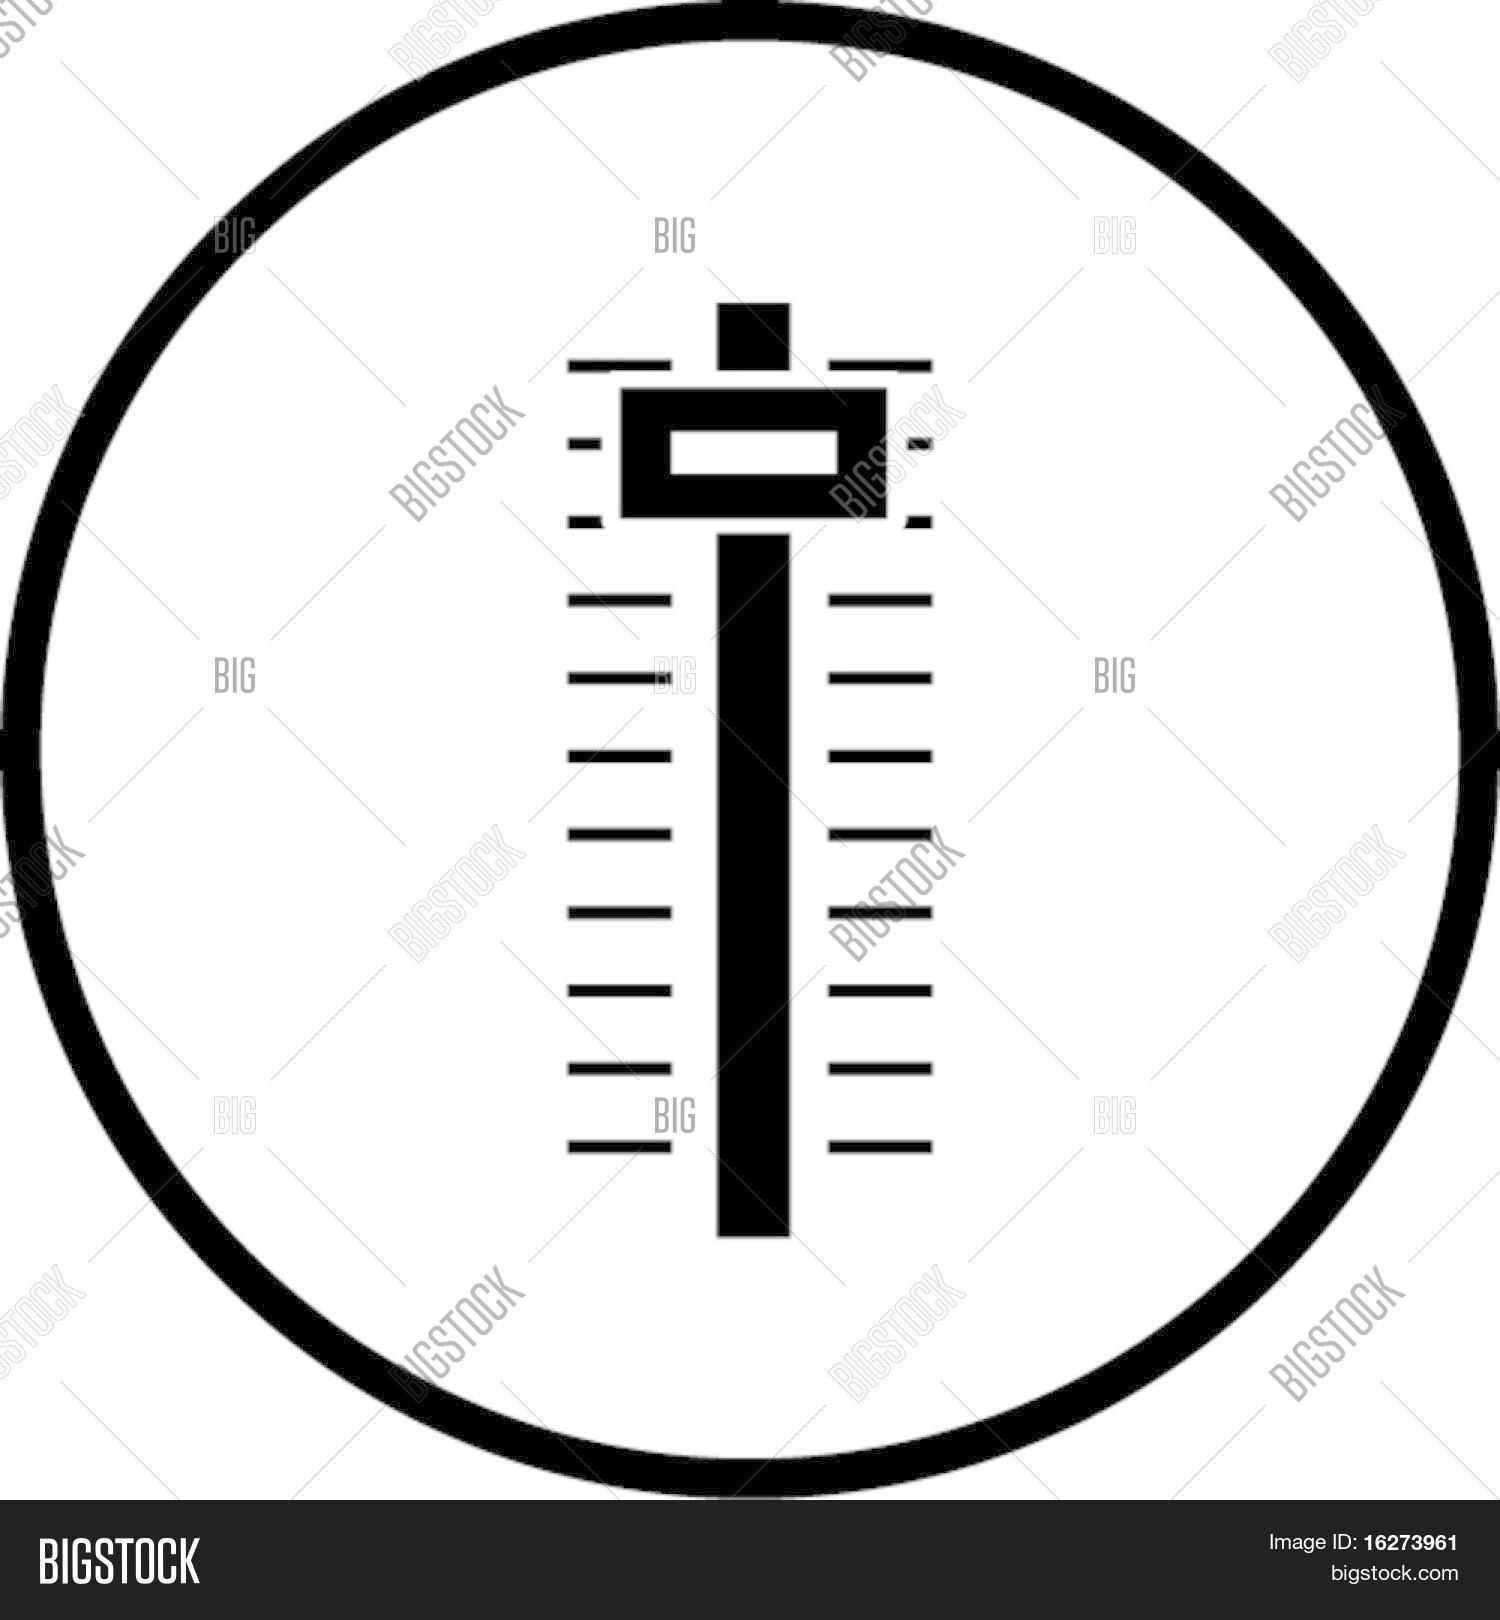 Dorable Dc Circuit Symbols Adornment - Electrical System Block ...